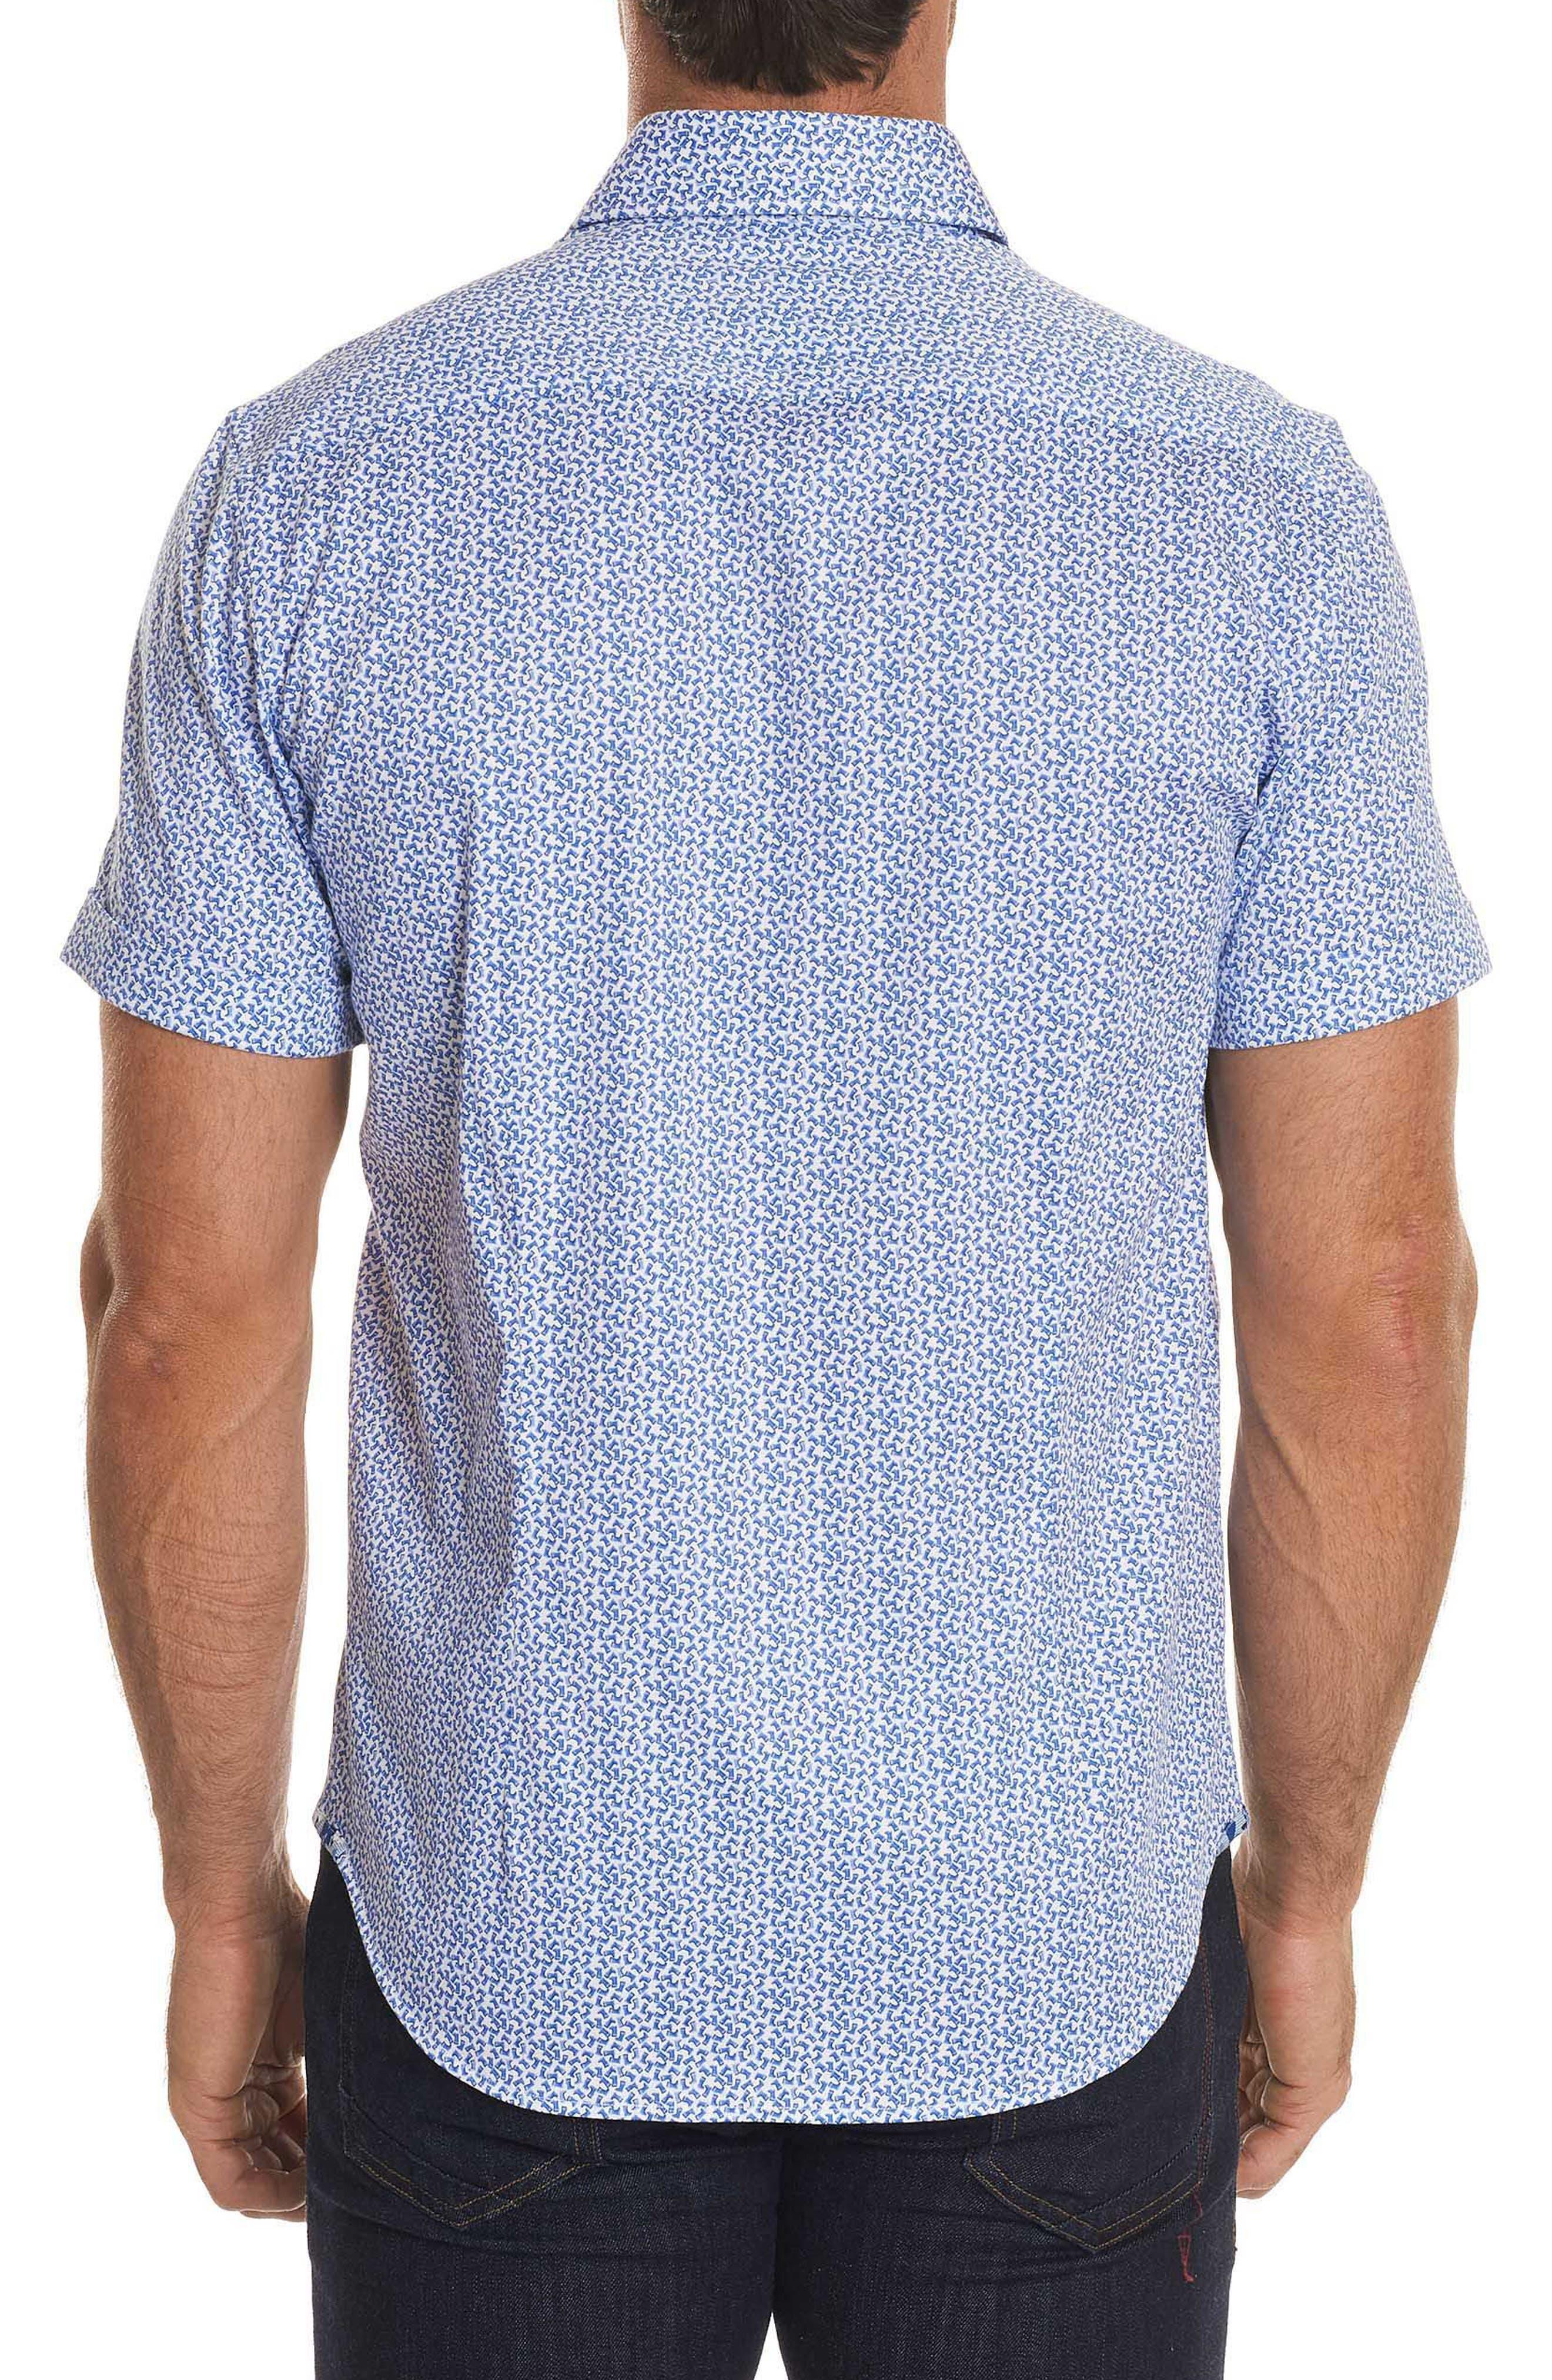 Hartman Tailored Fit Sport Shirt,                             Alternate thumbnail 2, color,                             Blue